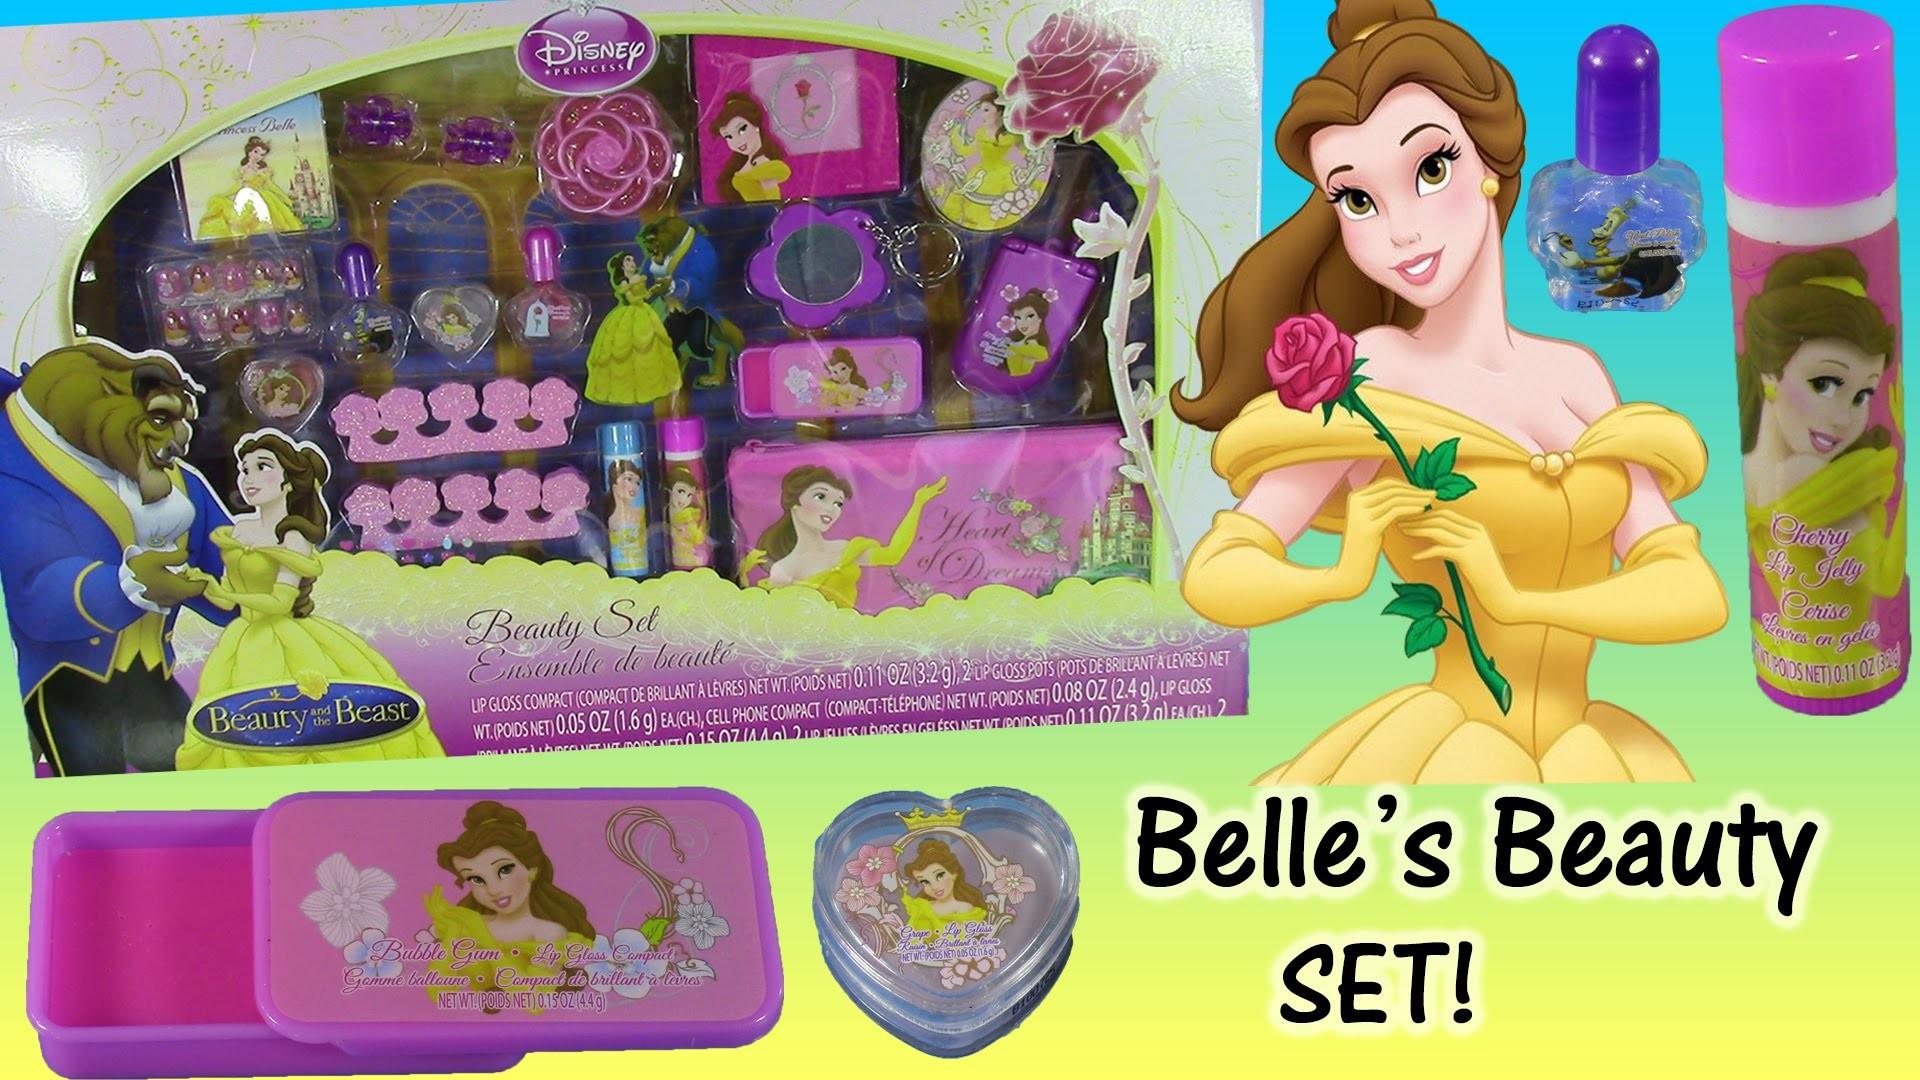 Res: 1920x1080, Belle Beauty & The Beast Jumbo Beauty Set! Disney Princess Belle Lip Gloss  Nail Polish Cosmetics! - YouTube